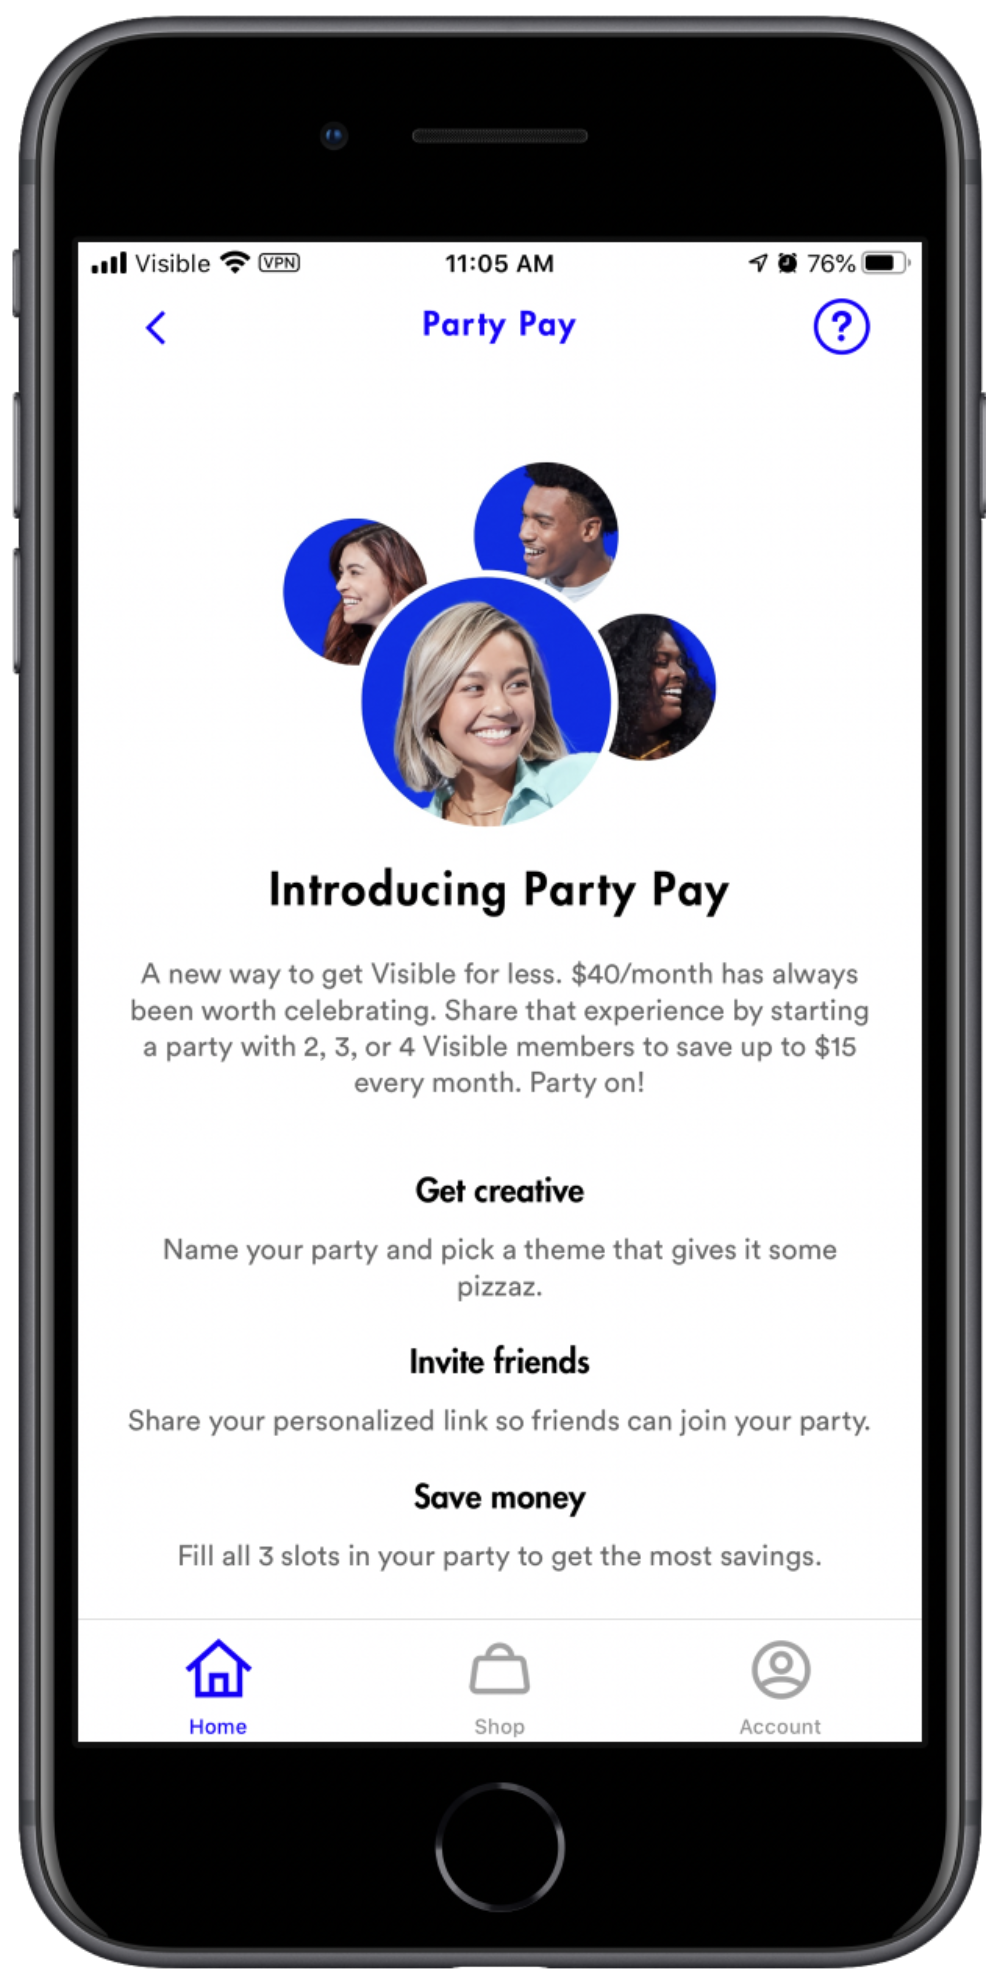 screenshot of visible party pay